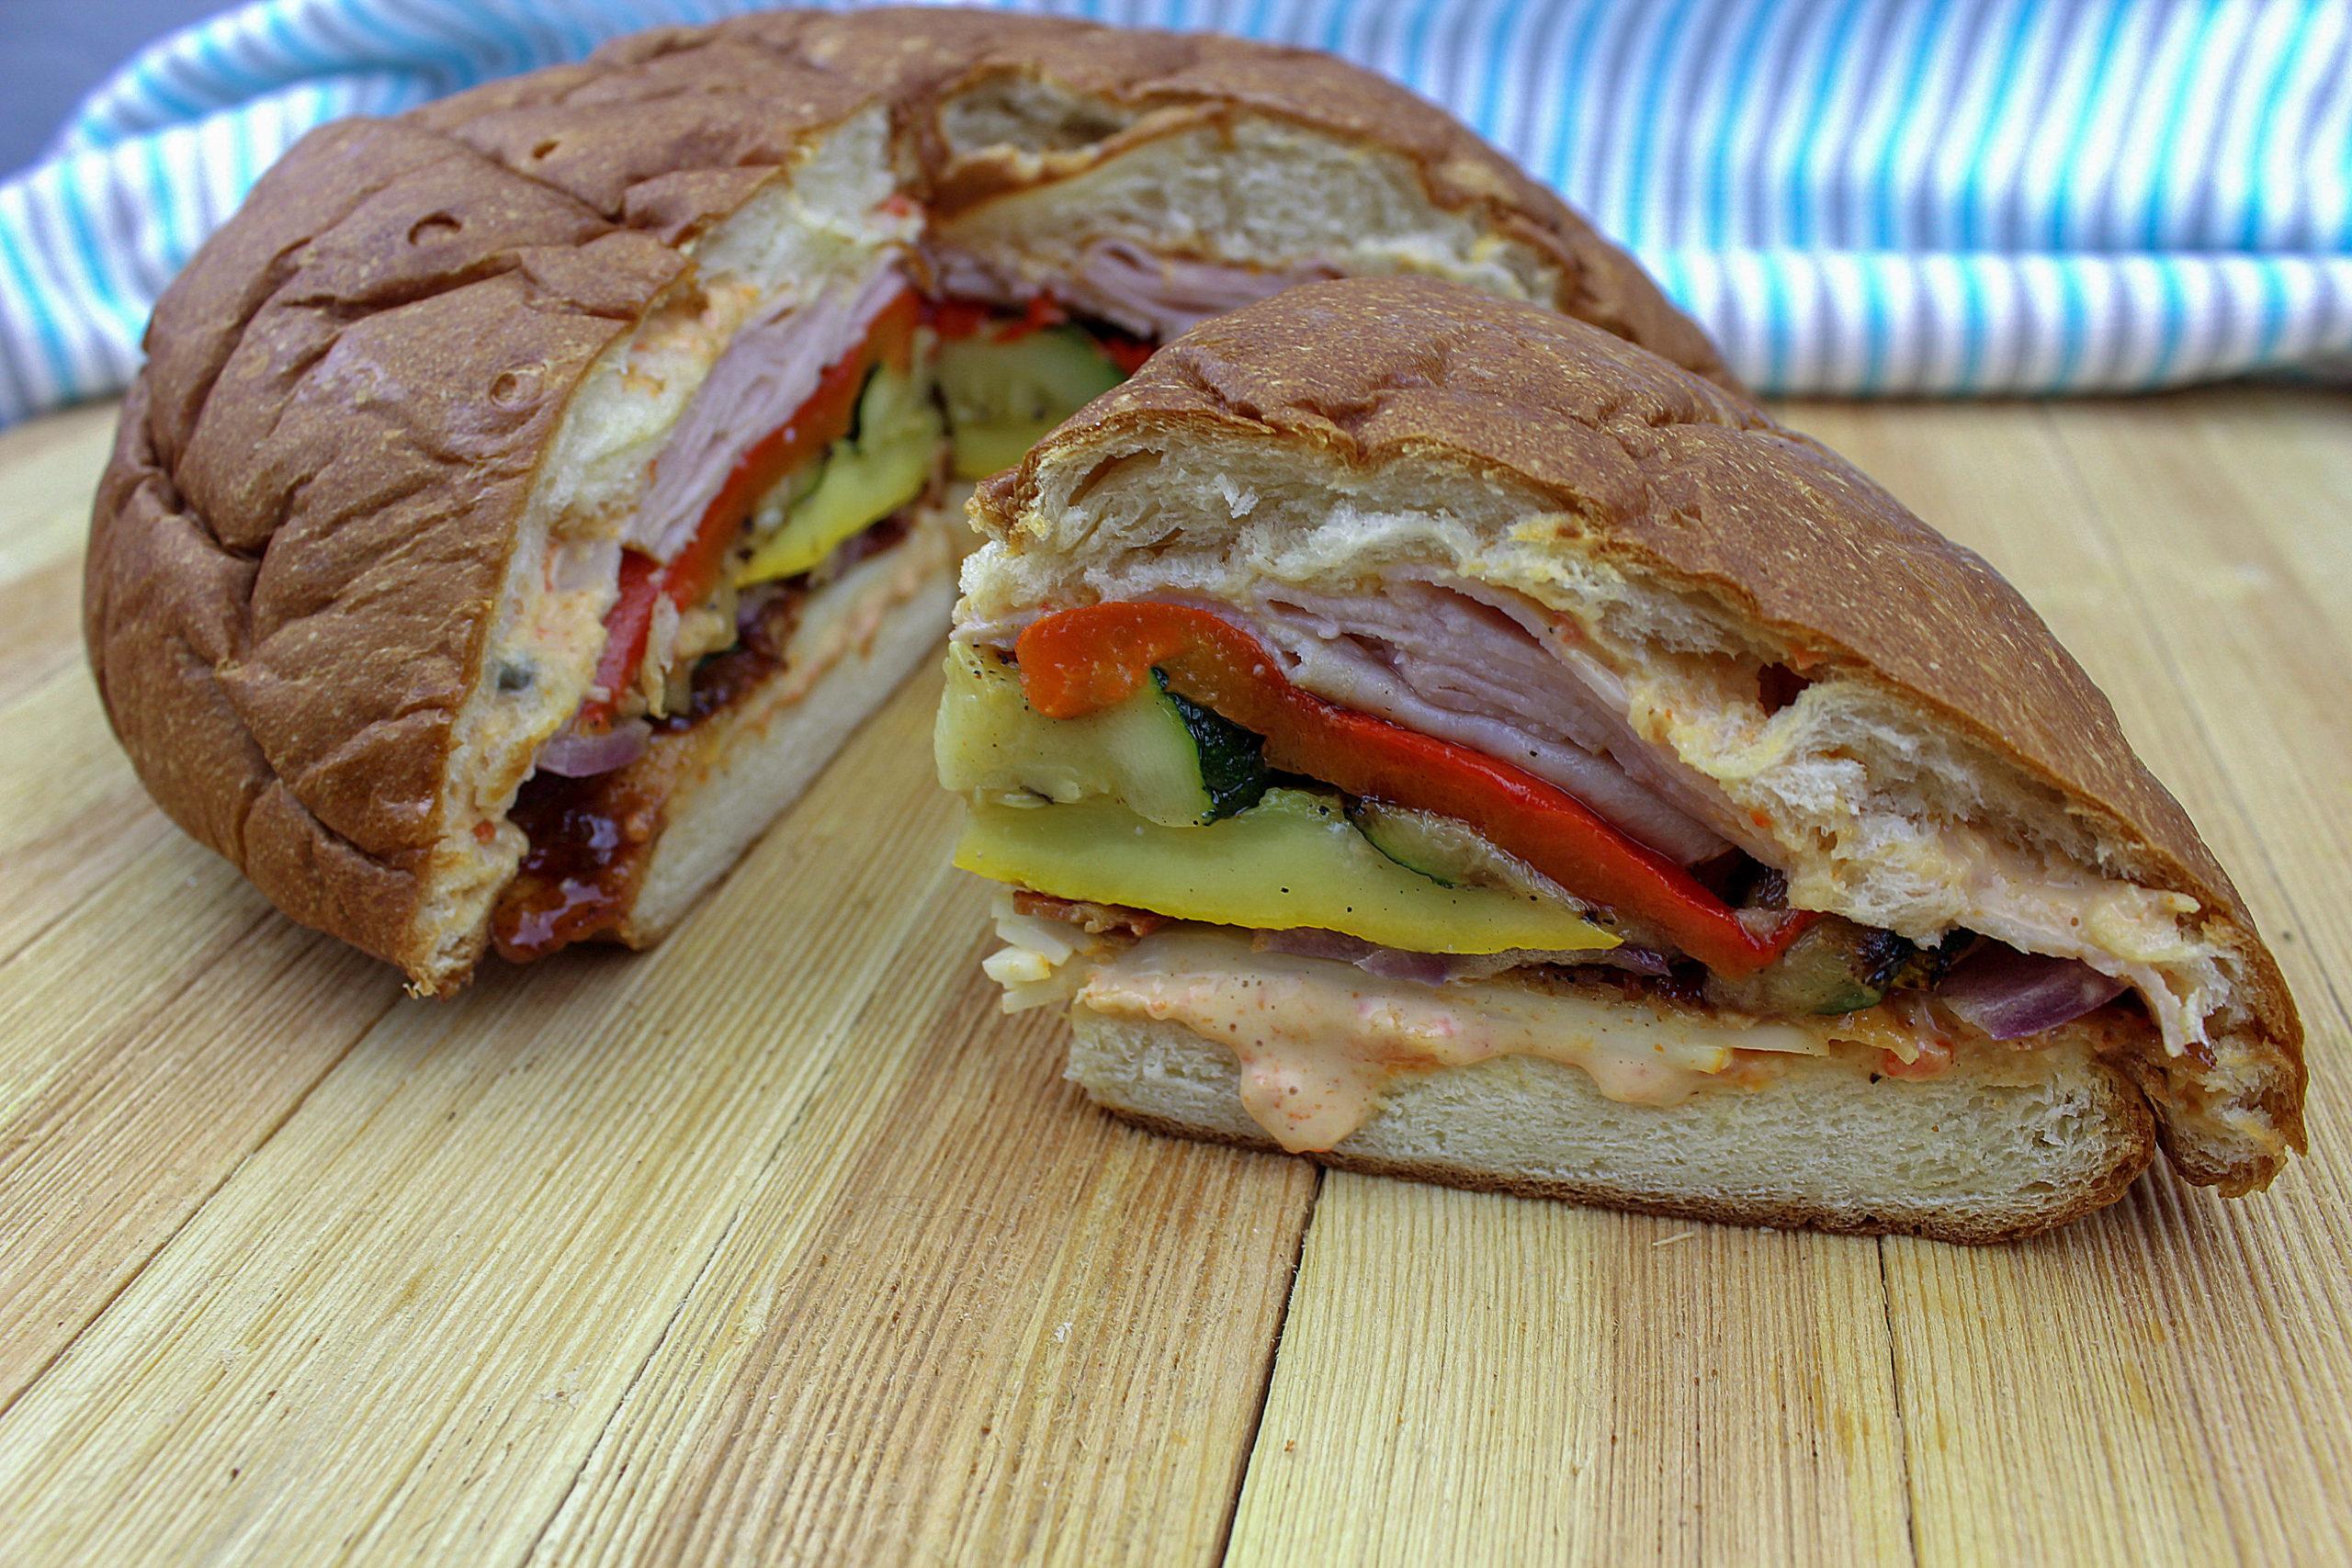 Summer Picnic Sandwich sliced